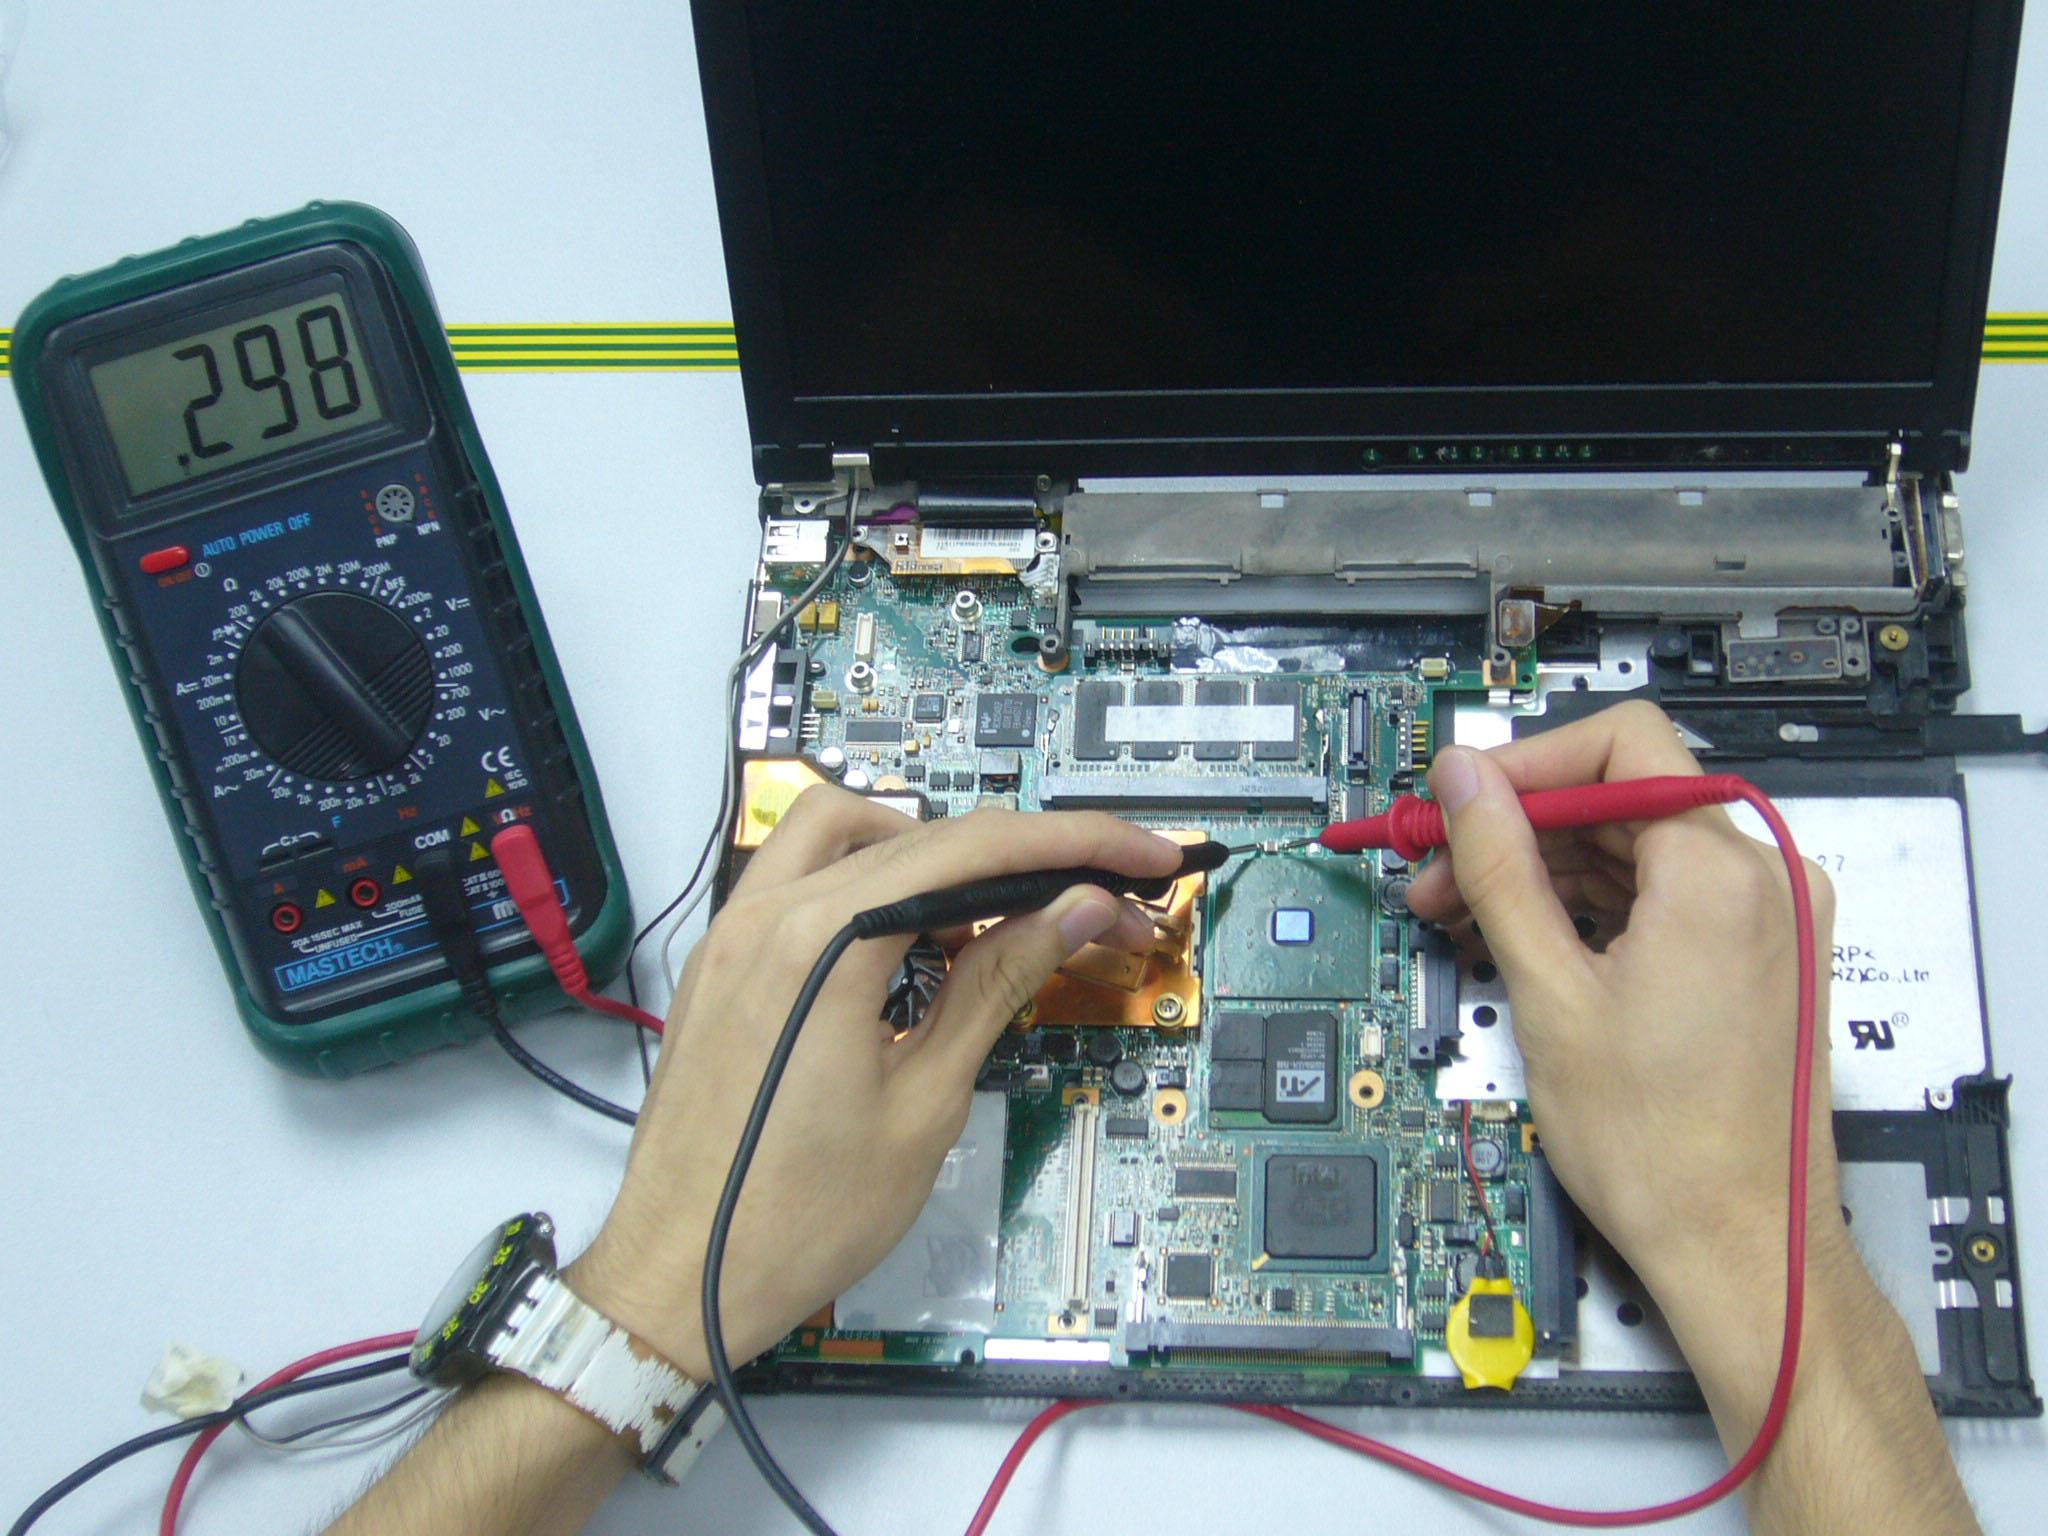 Comuter repairs